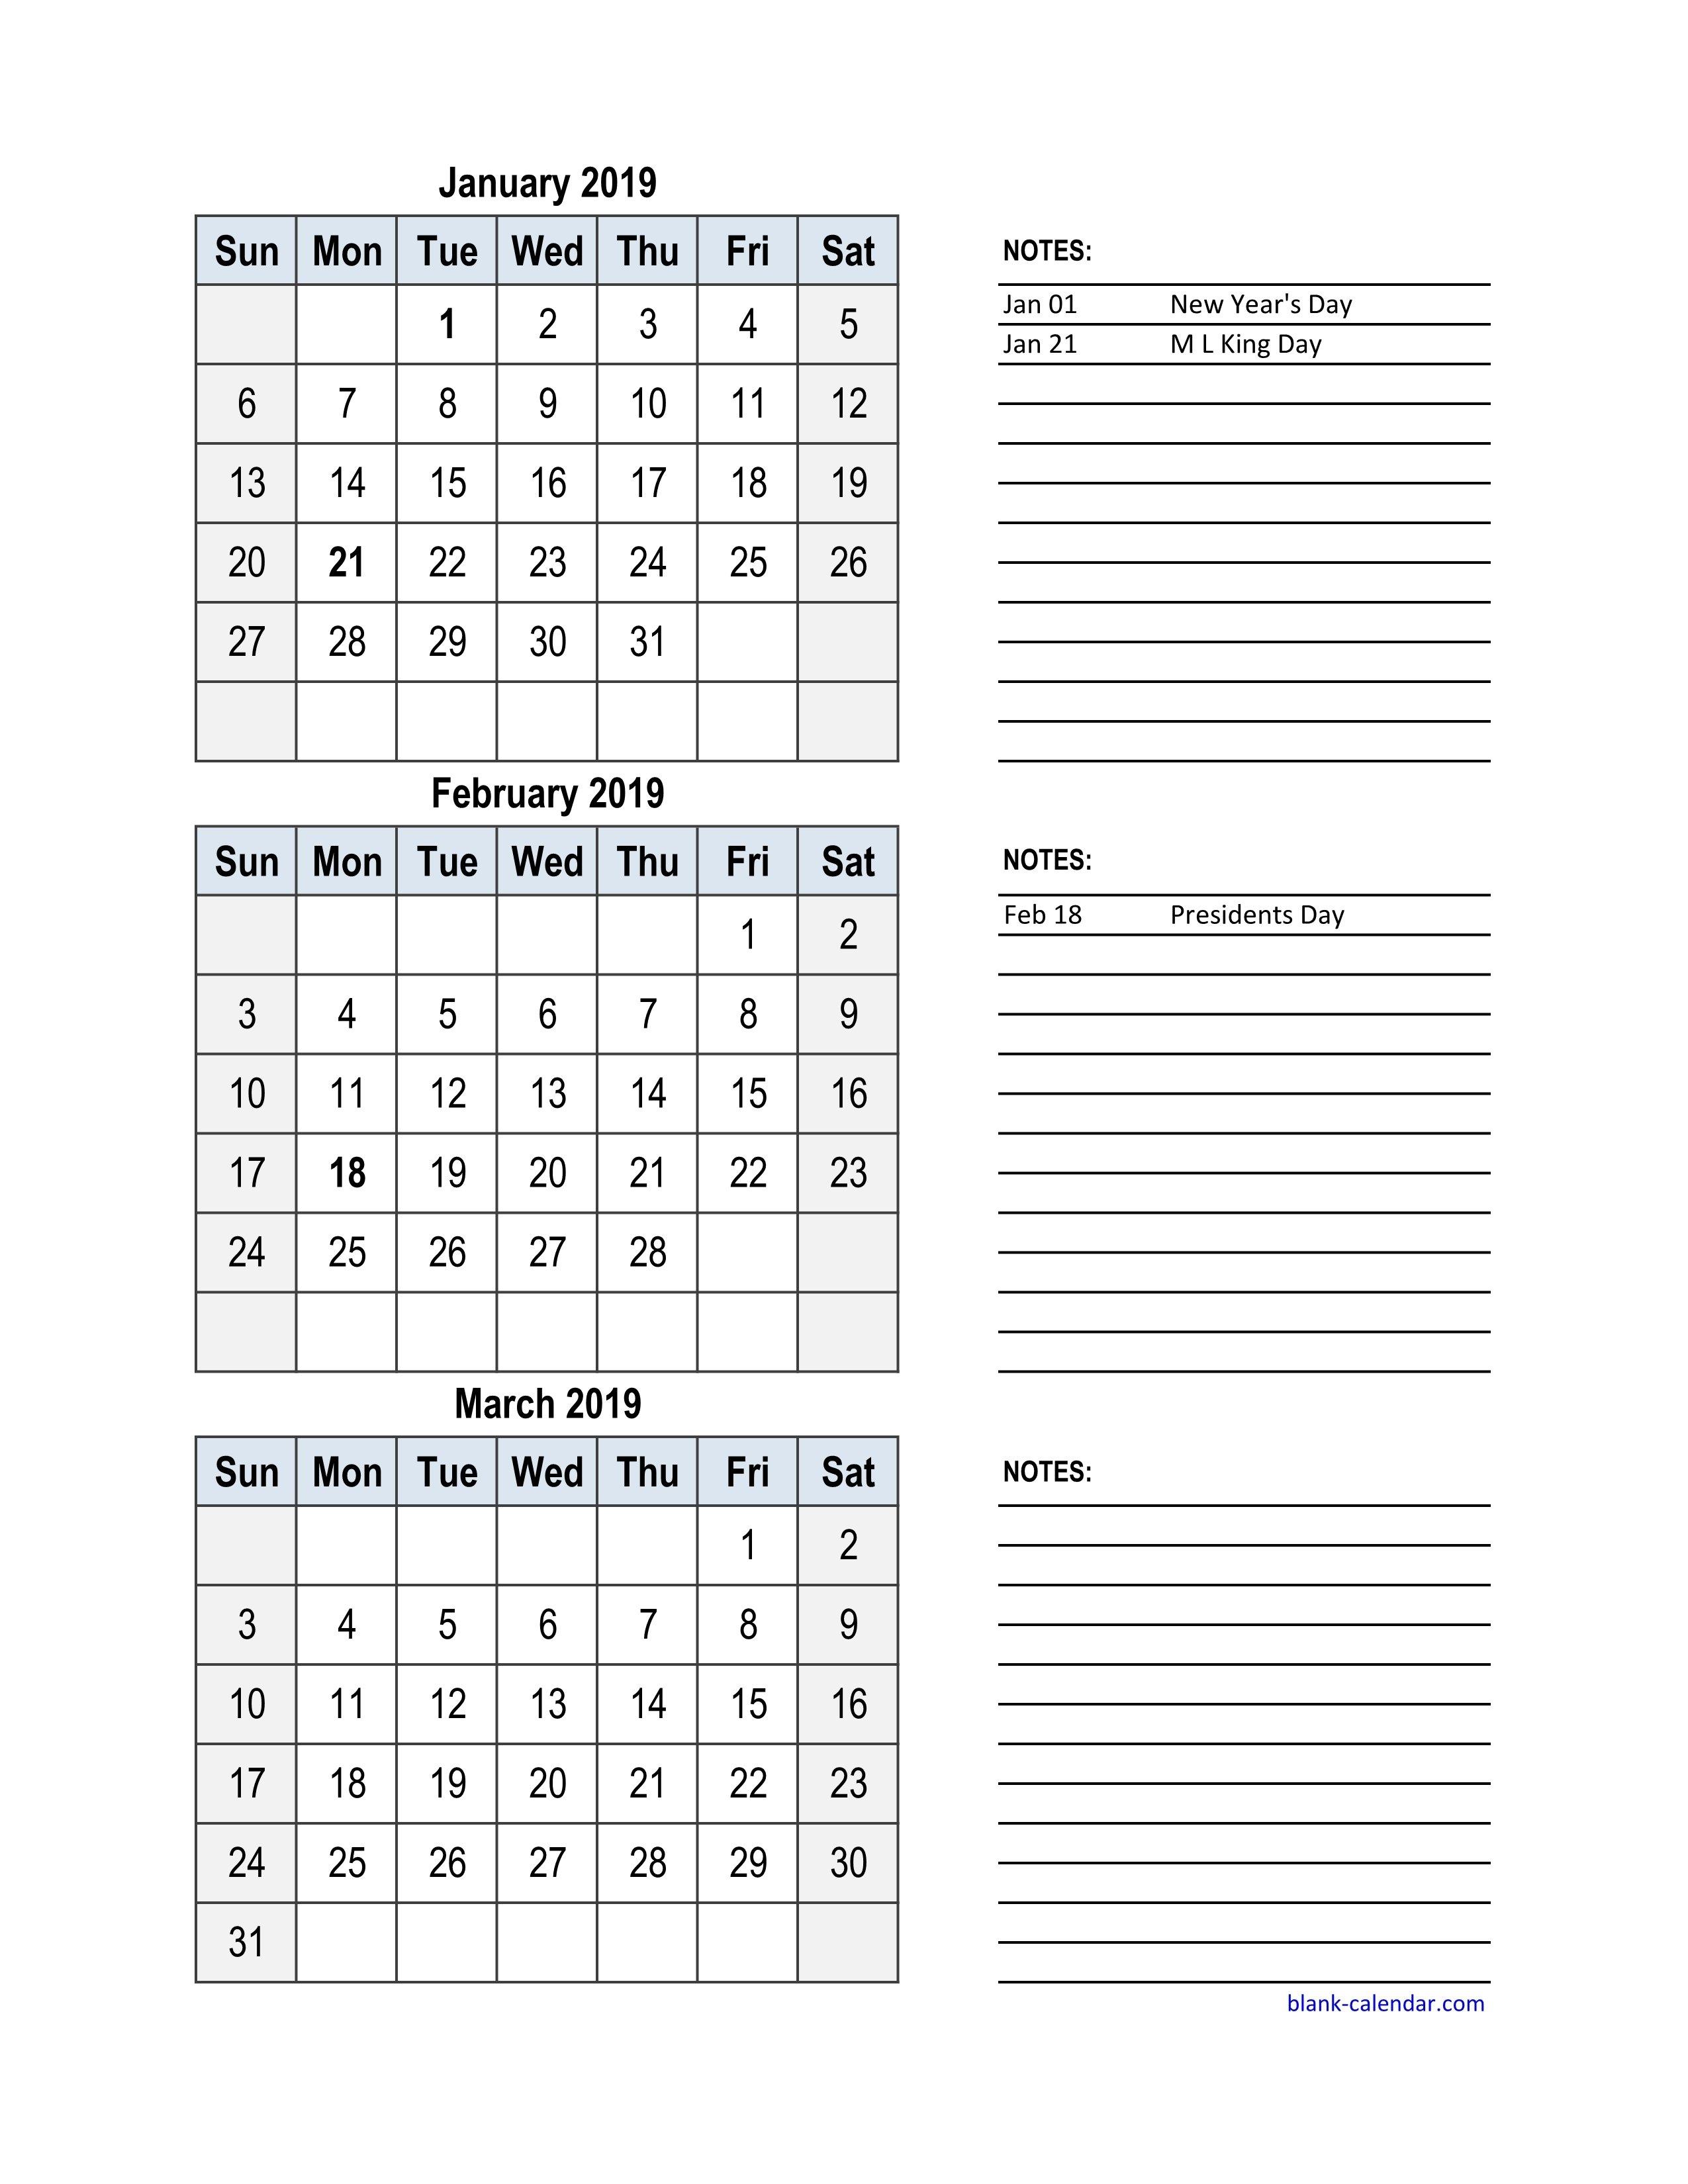 Free Download 2019 Excel Calendar, 3 Months In One Excel Spreadsheet 3 Month Calendar 2019 Printable